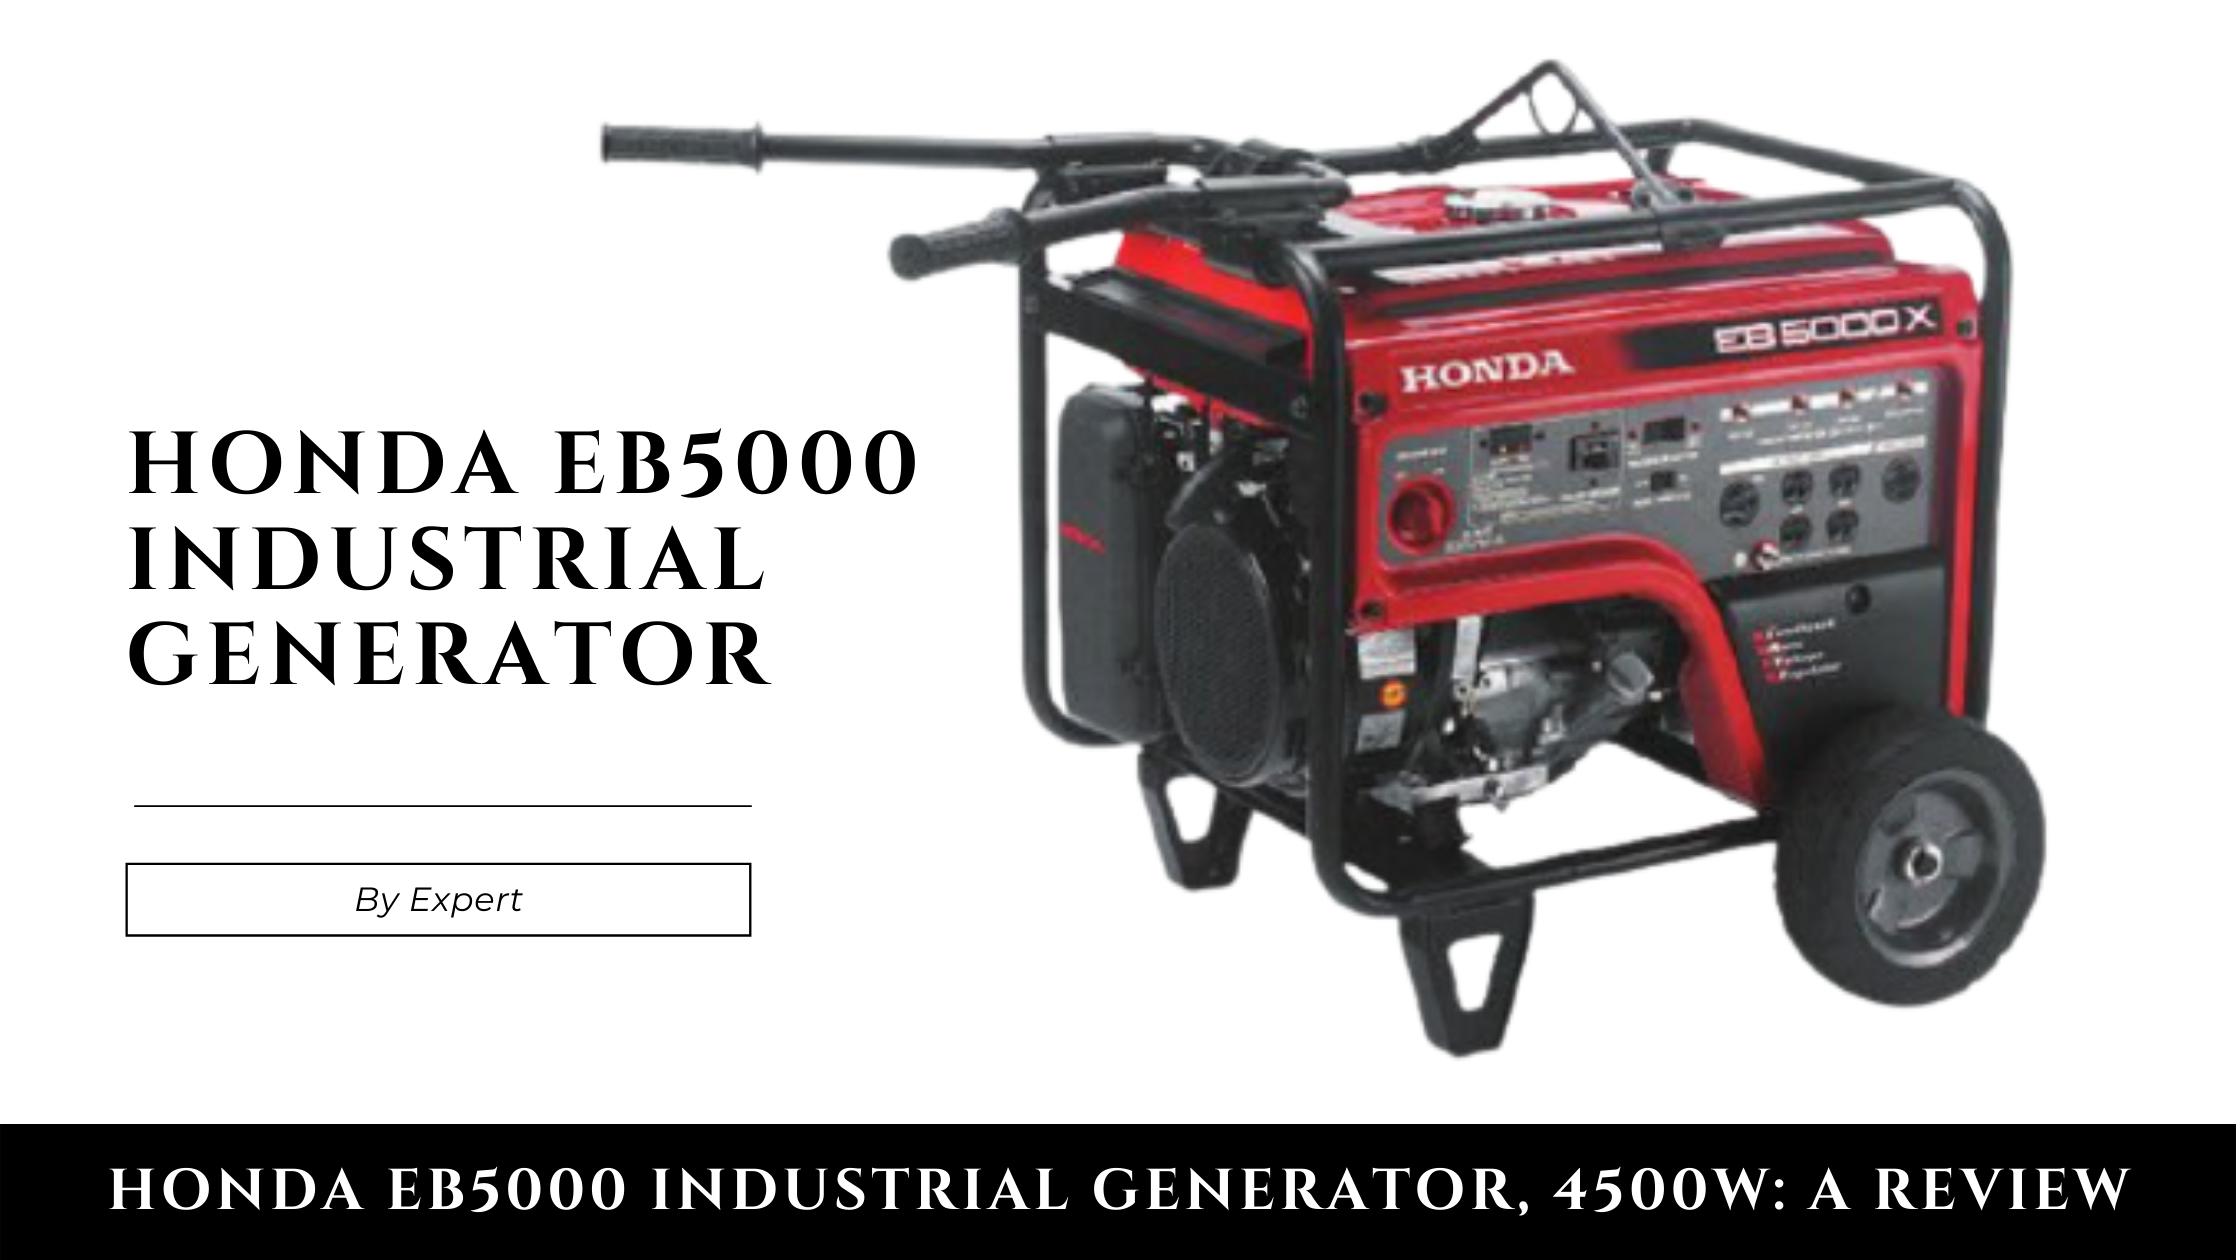 HONDA EB5000 Industrial Generator